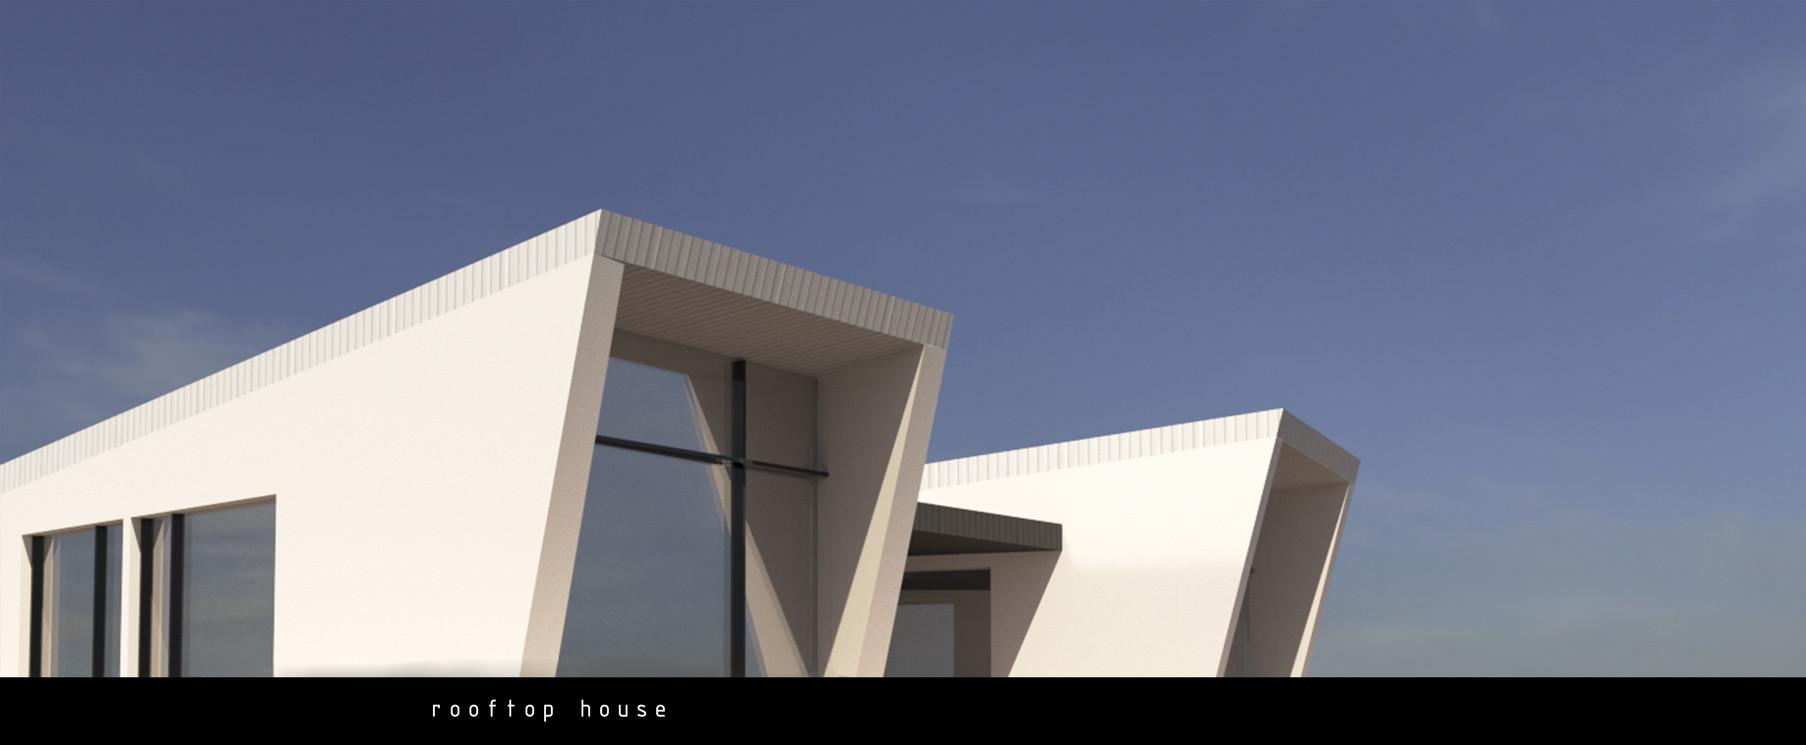 rofftop_house2.jpg